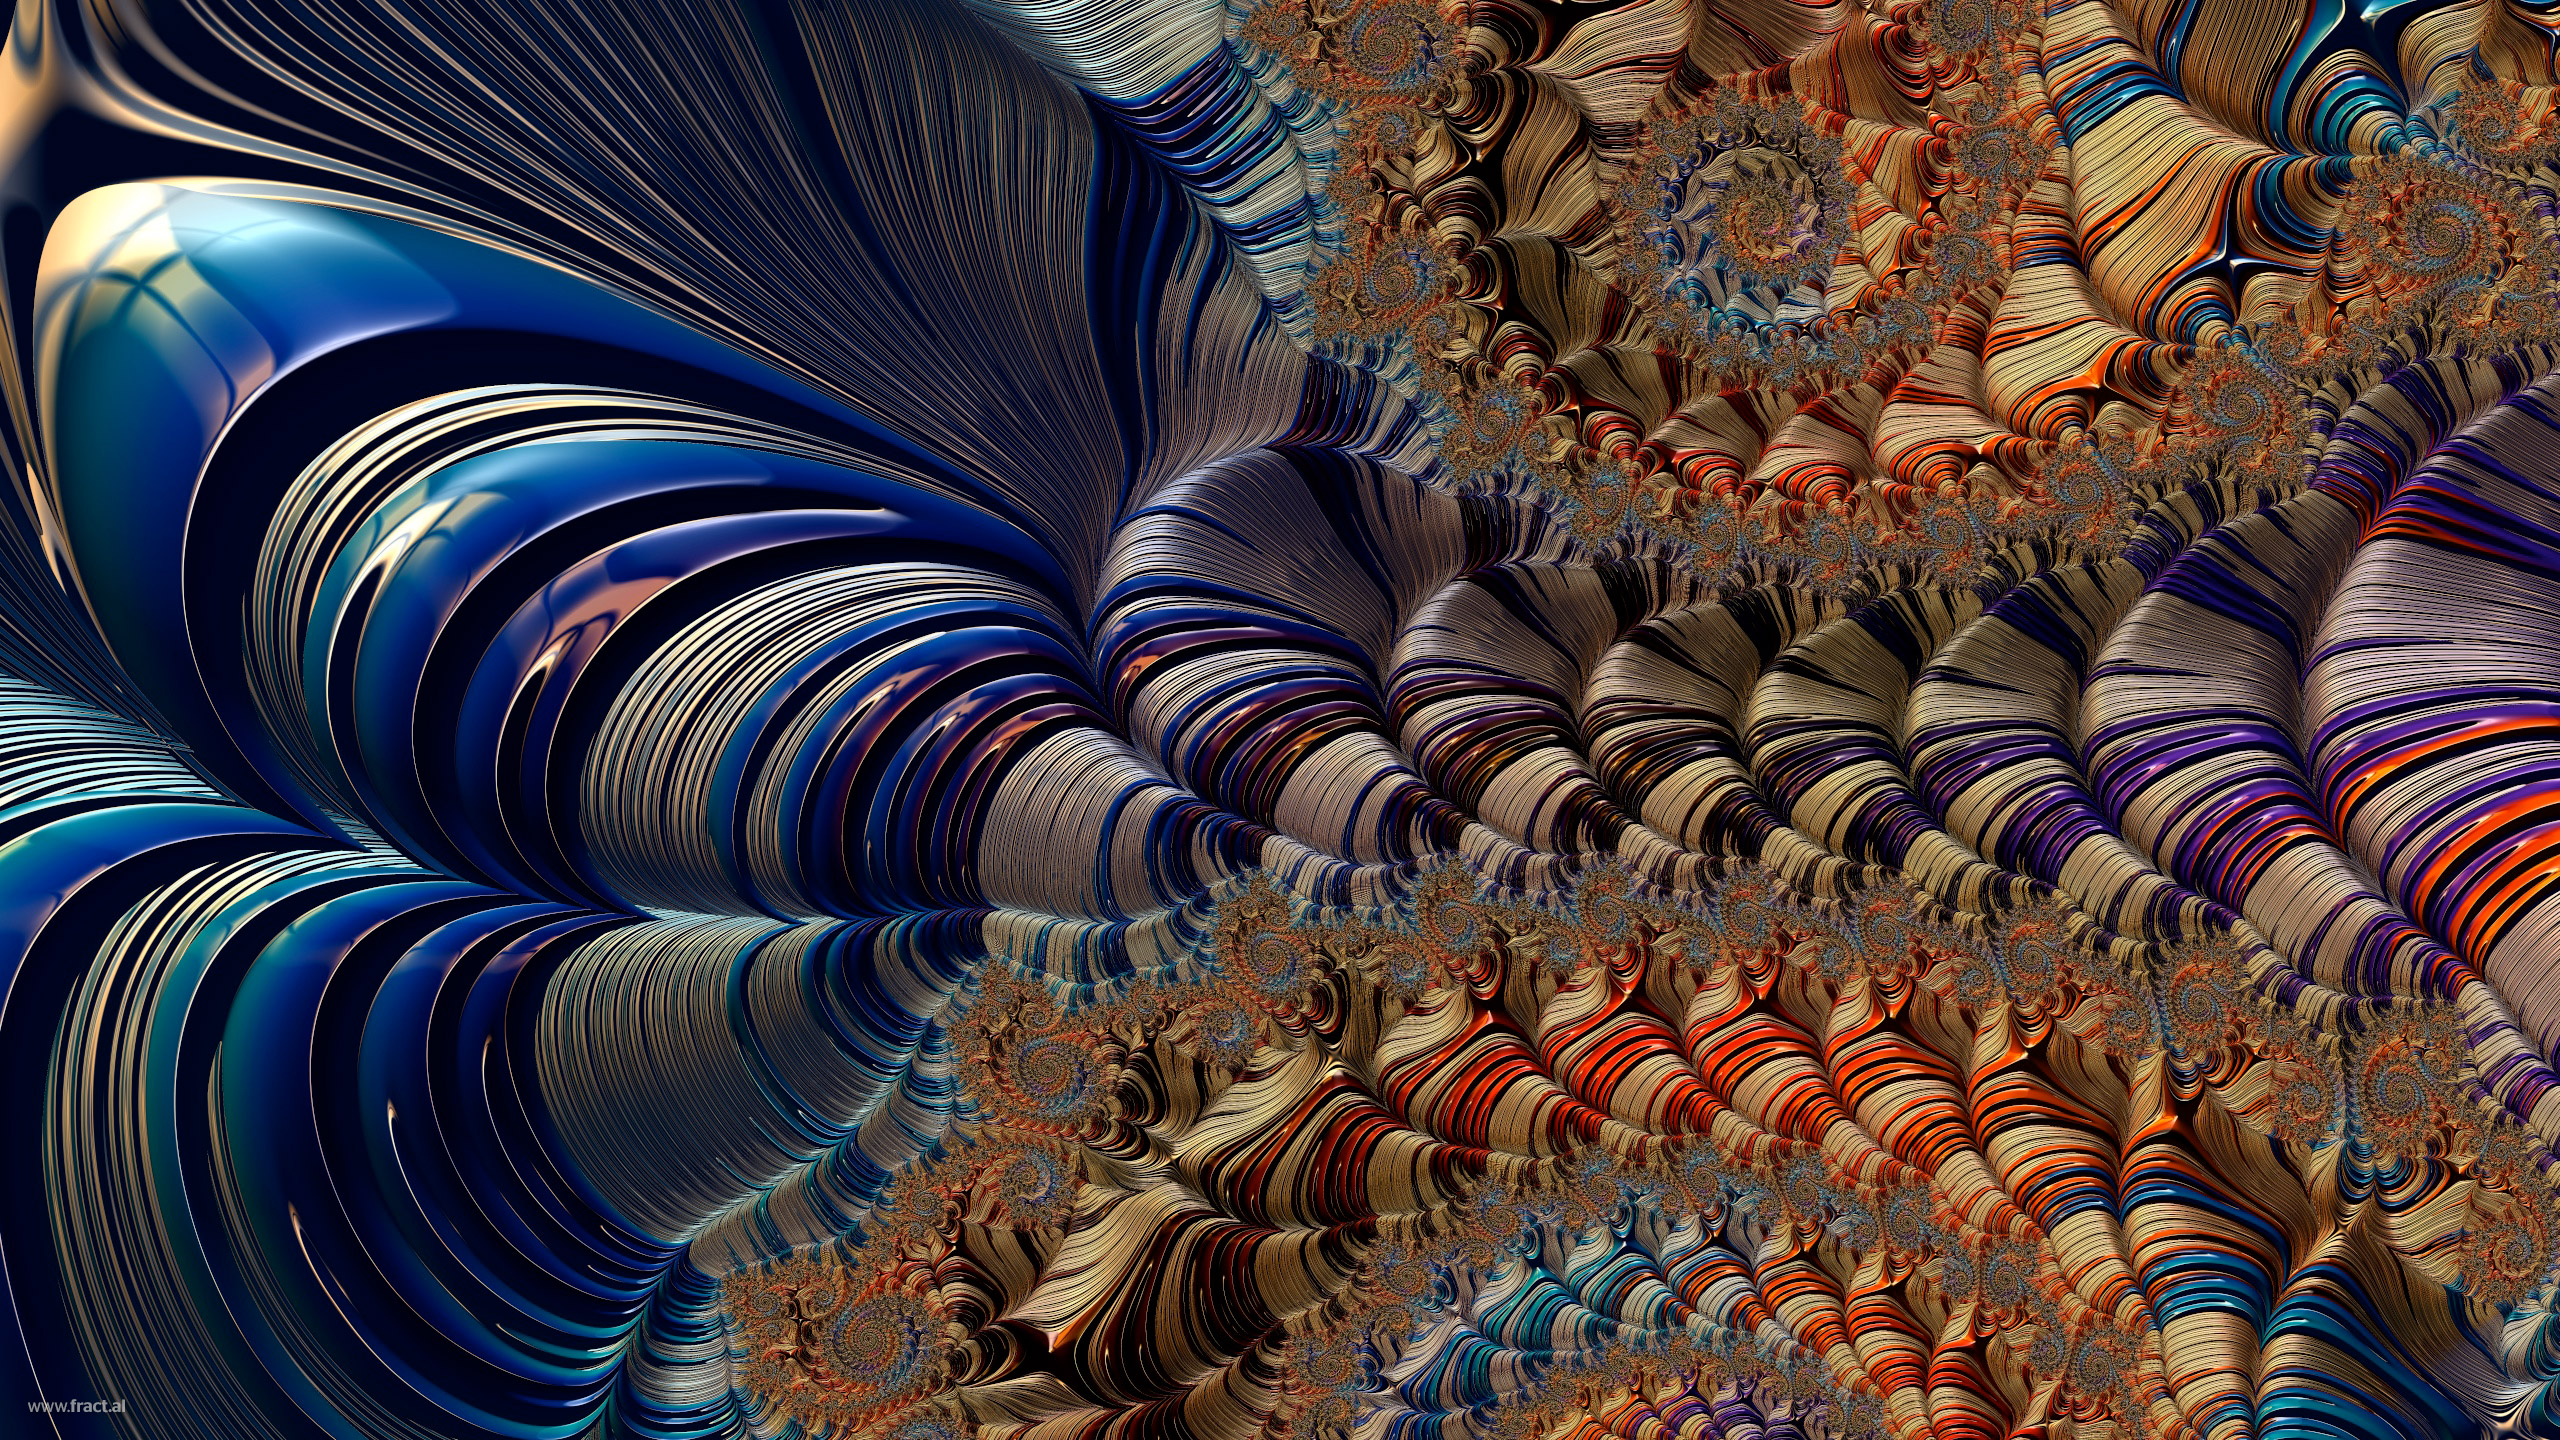 Desktop 3d Live Wallpaper Showcase 1 Frax